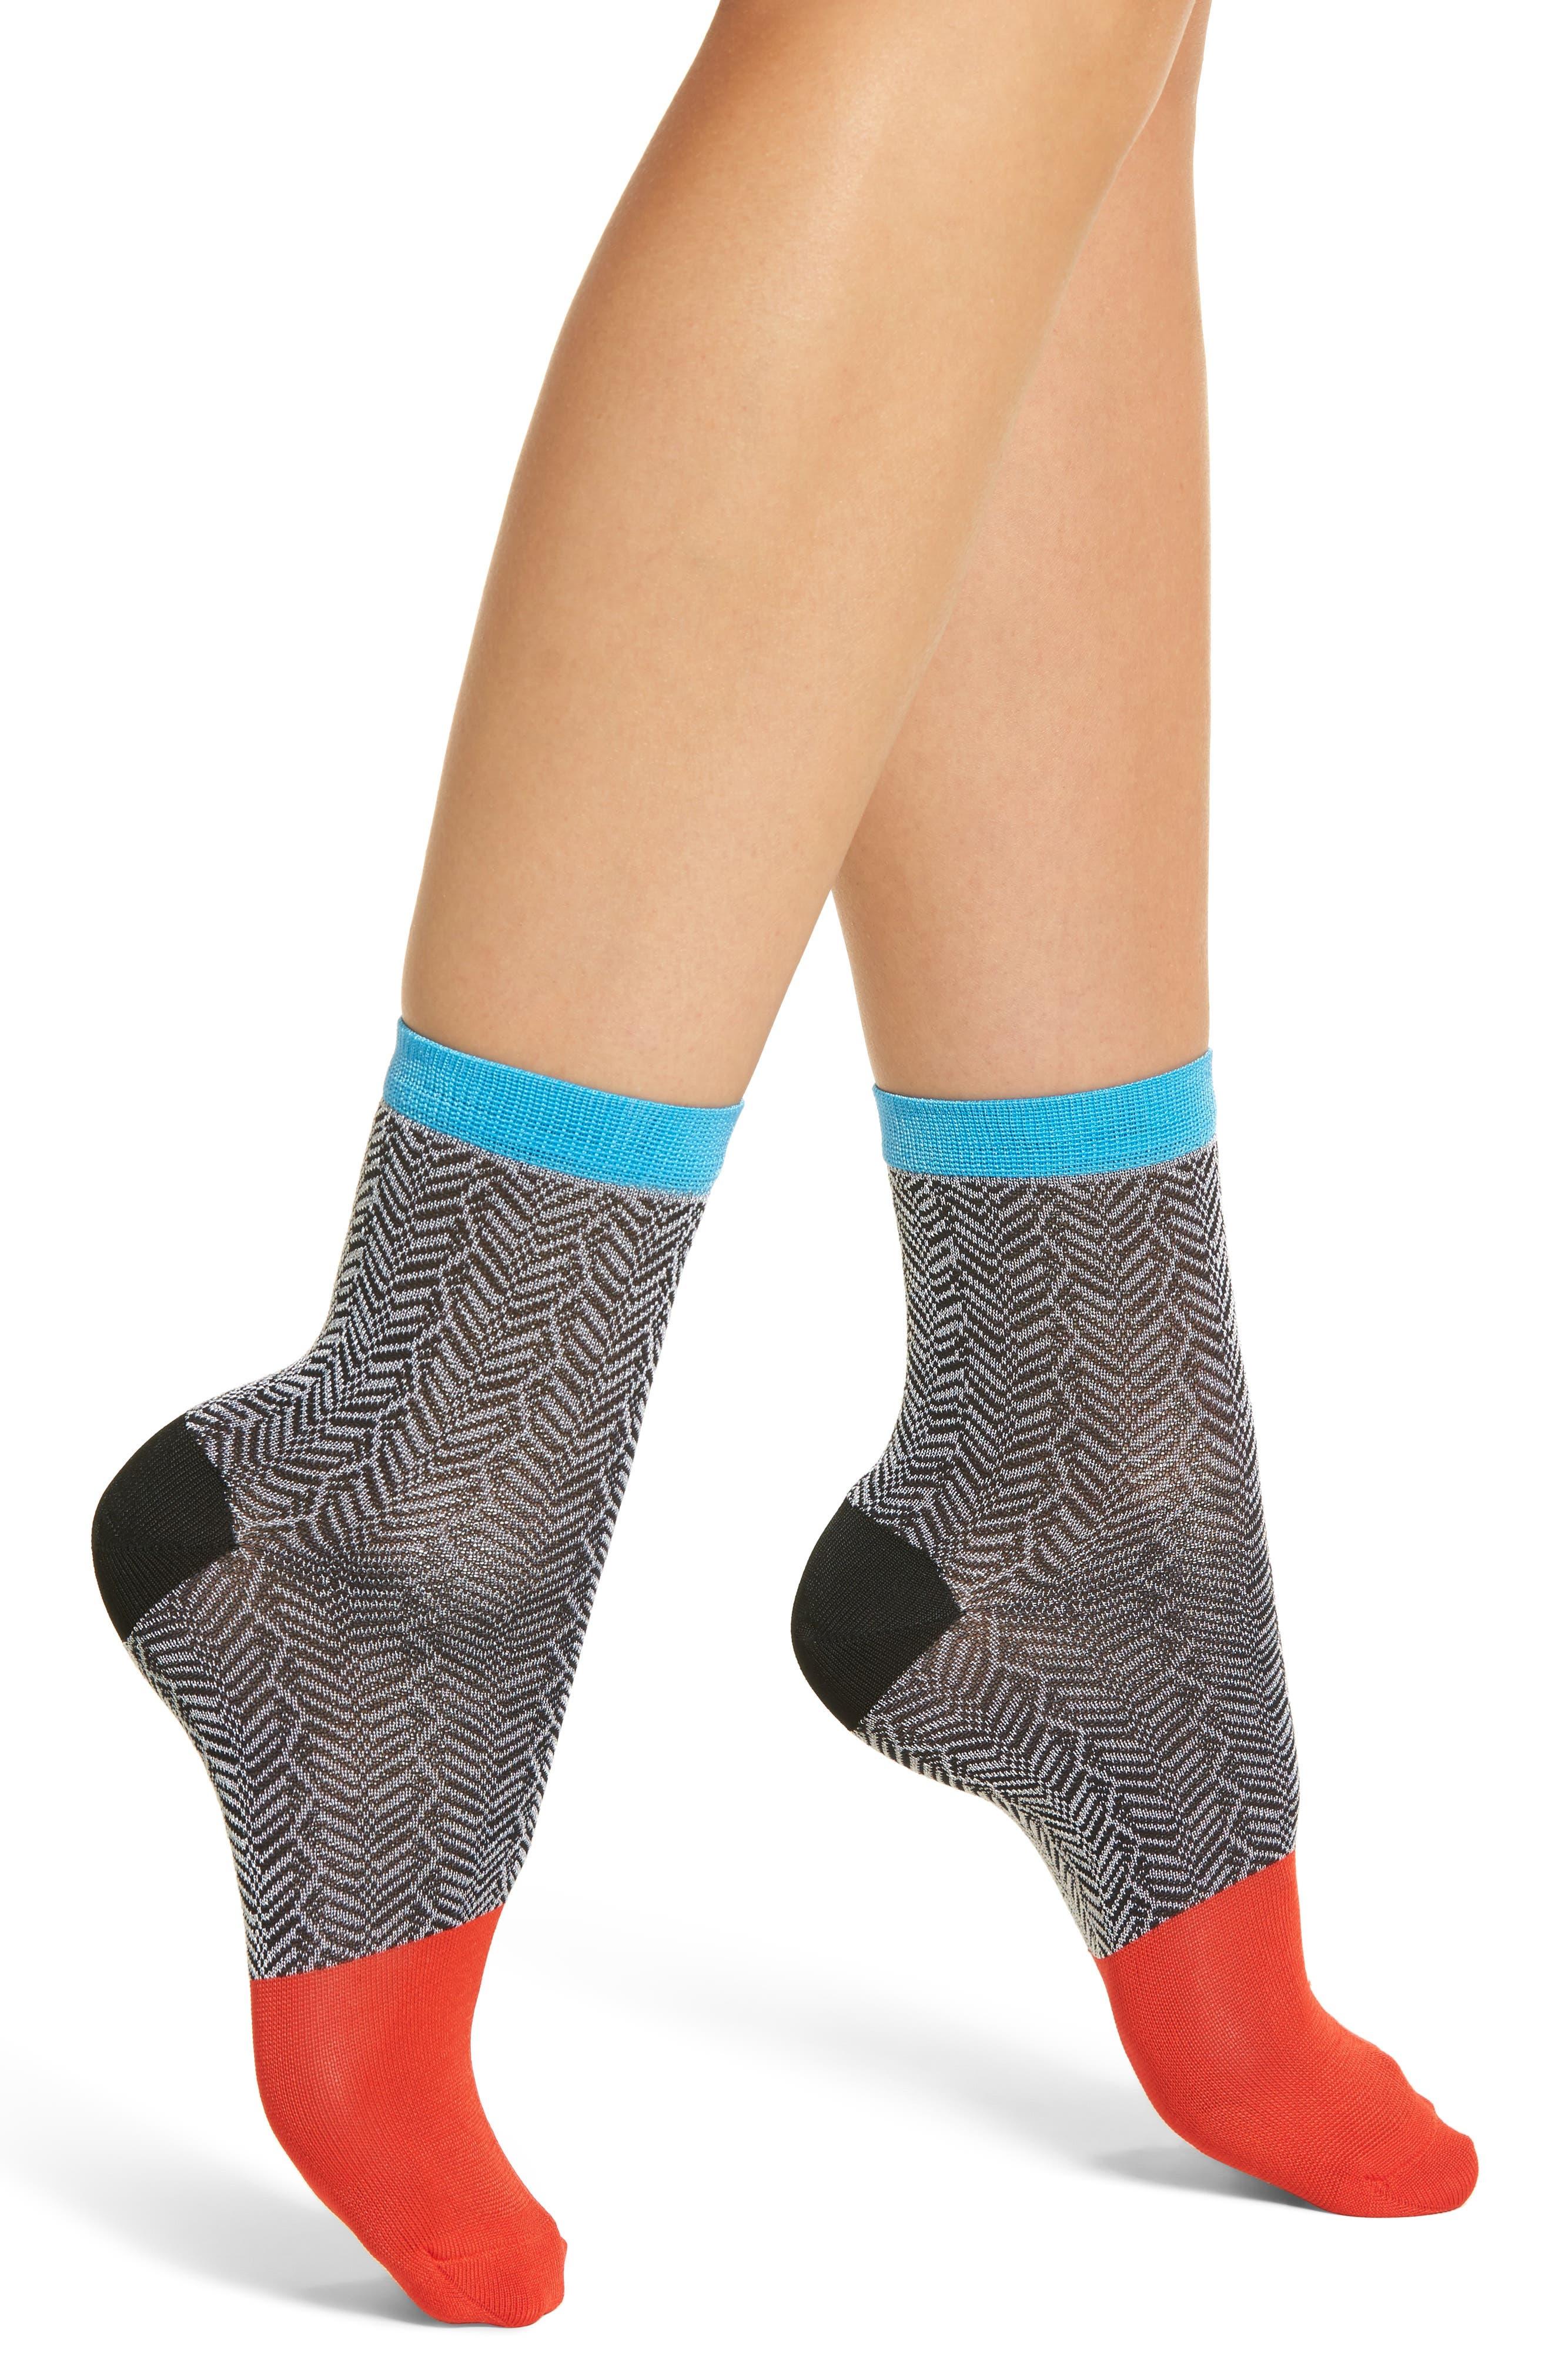 Jill Ankle Socks,                         Main,                         color, 013